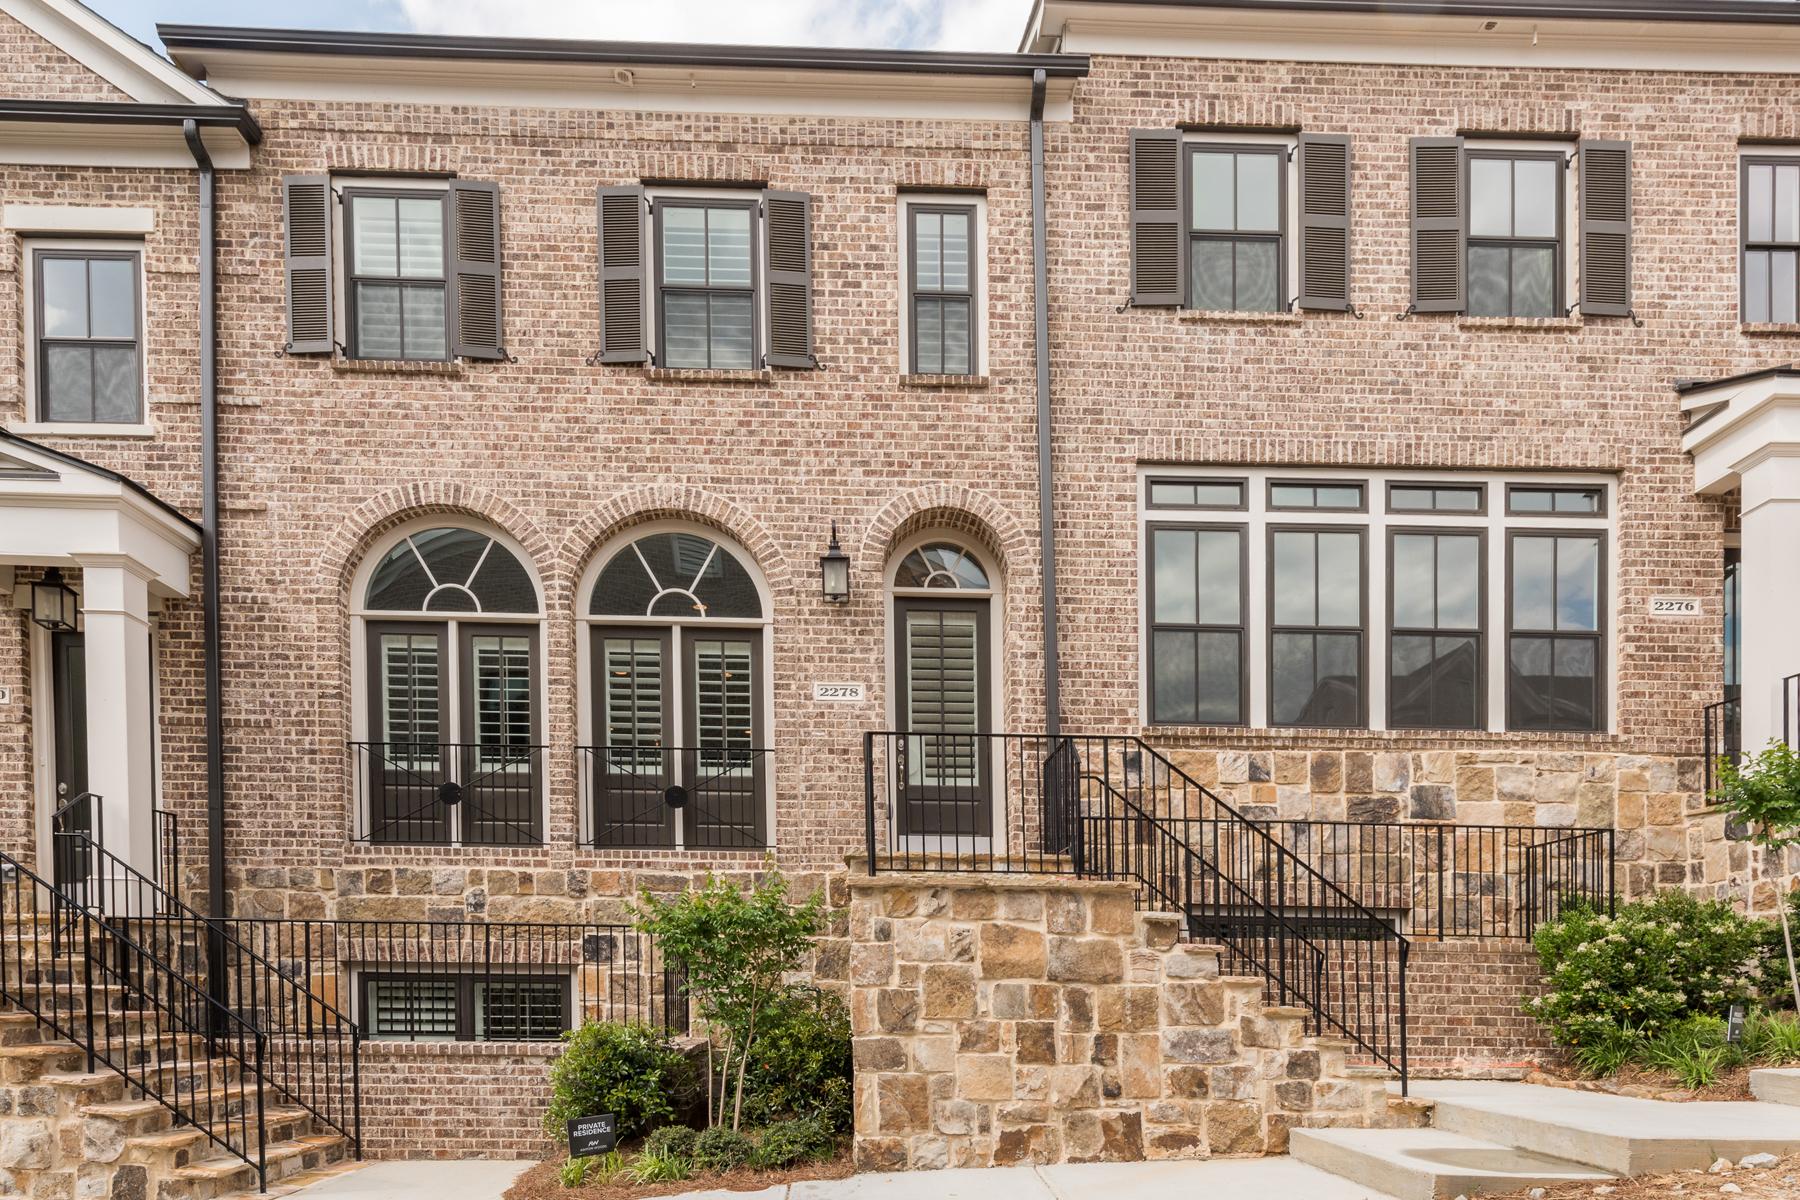 Single Family Home for Sale at Stunning New Custom Designed Townhome 2278 Garrison Street NE Atlanta, Georgia, 30319 United States